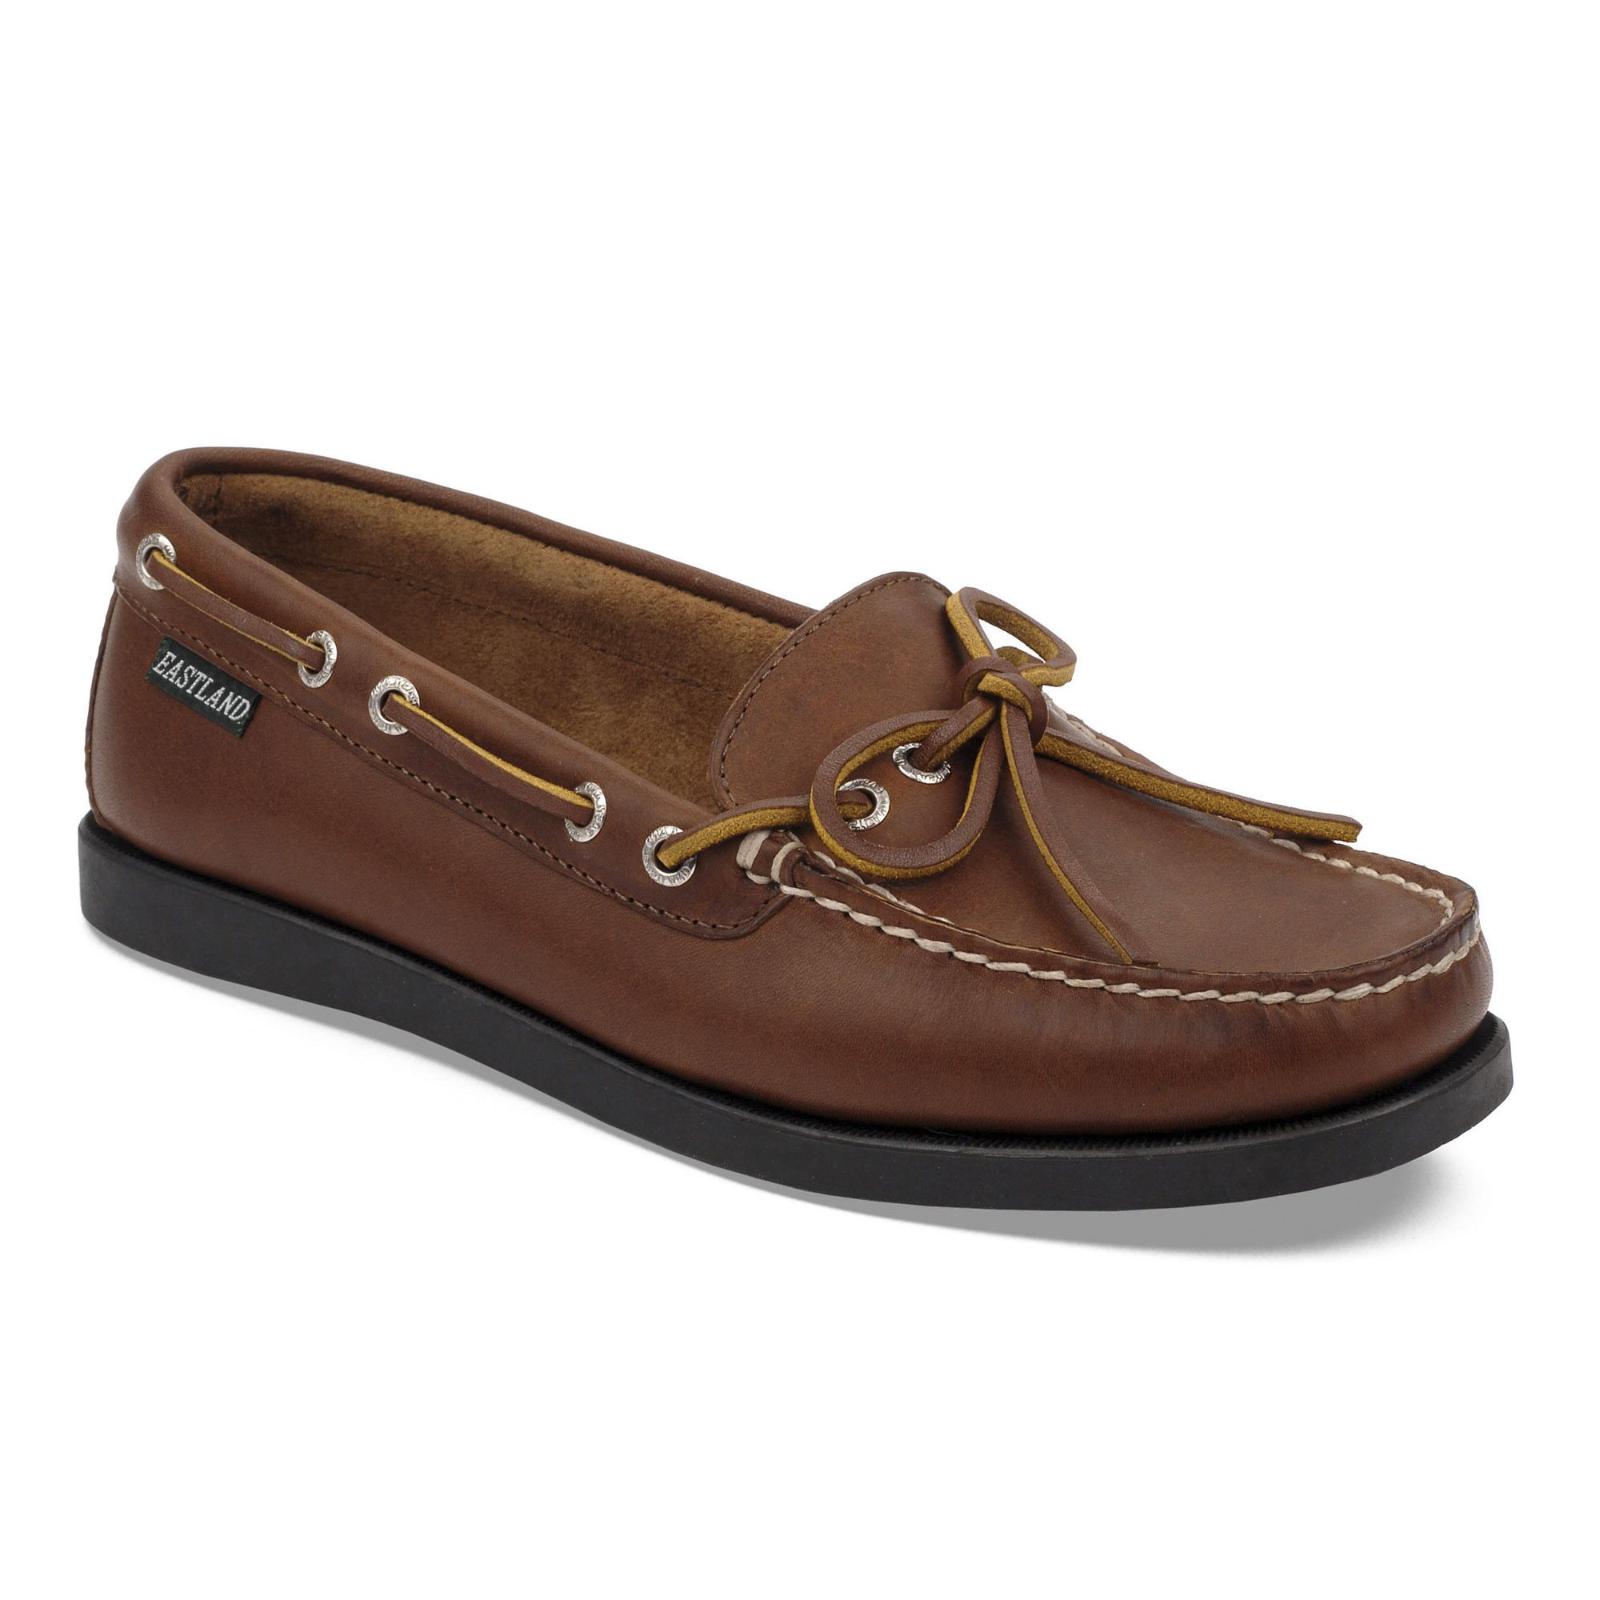 Women's Eastland Yarmouth Slip-on shoes Tan Size 9.5 9.5 9.5  NFOZZ-M343 f330aa